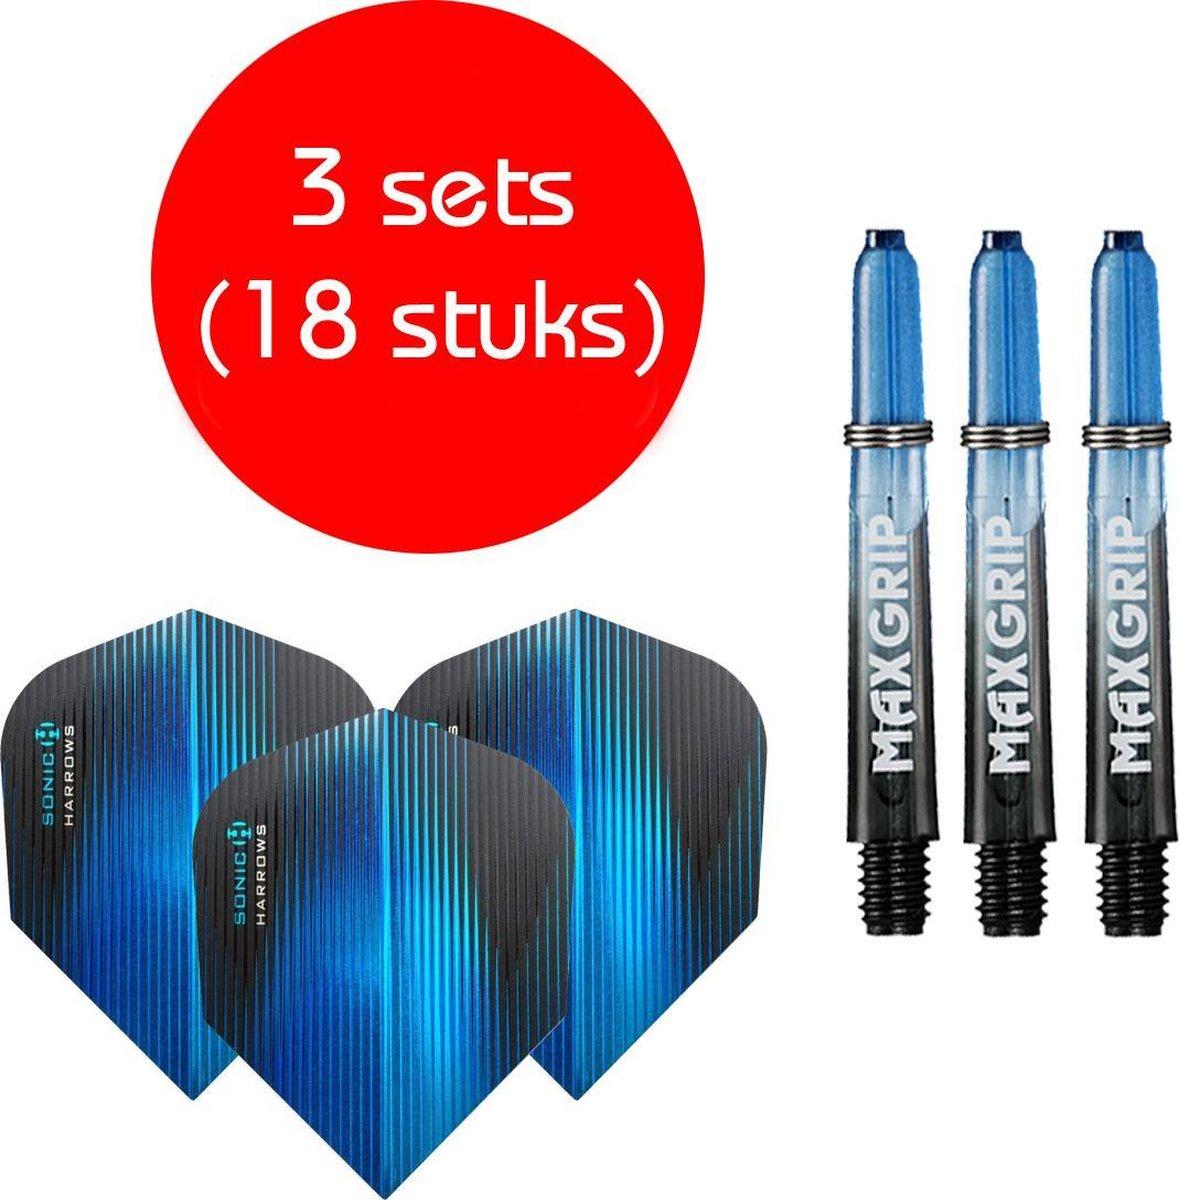 Dragon darts - Maxgrip - 3 sets - darts shafts - zwart-blauw - short - en 3 sets - Sonic blauw - darts flights